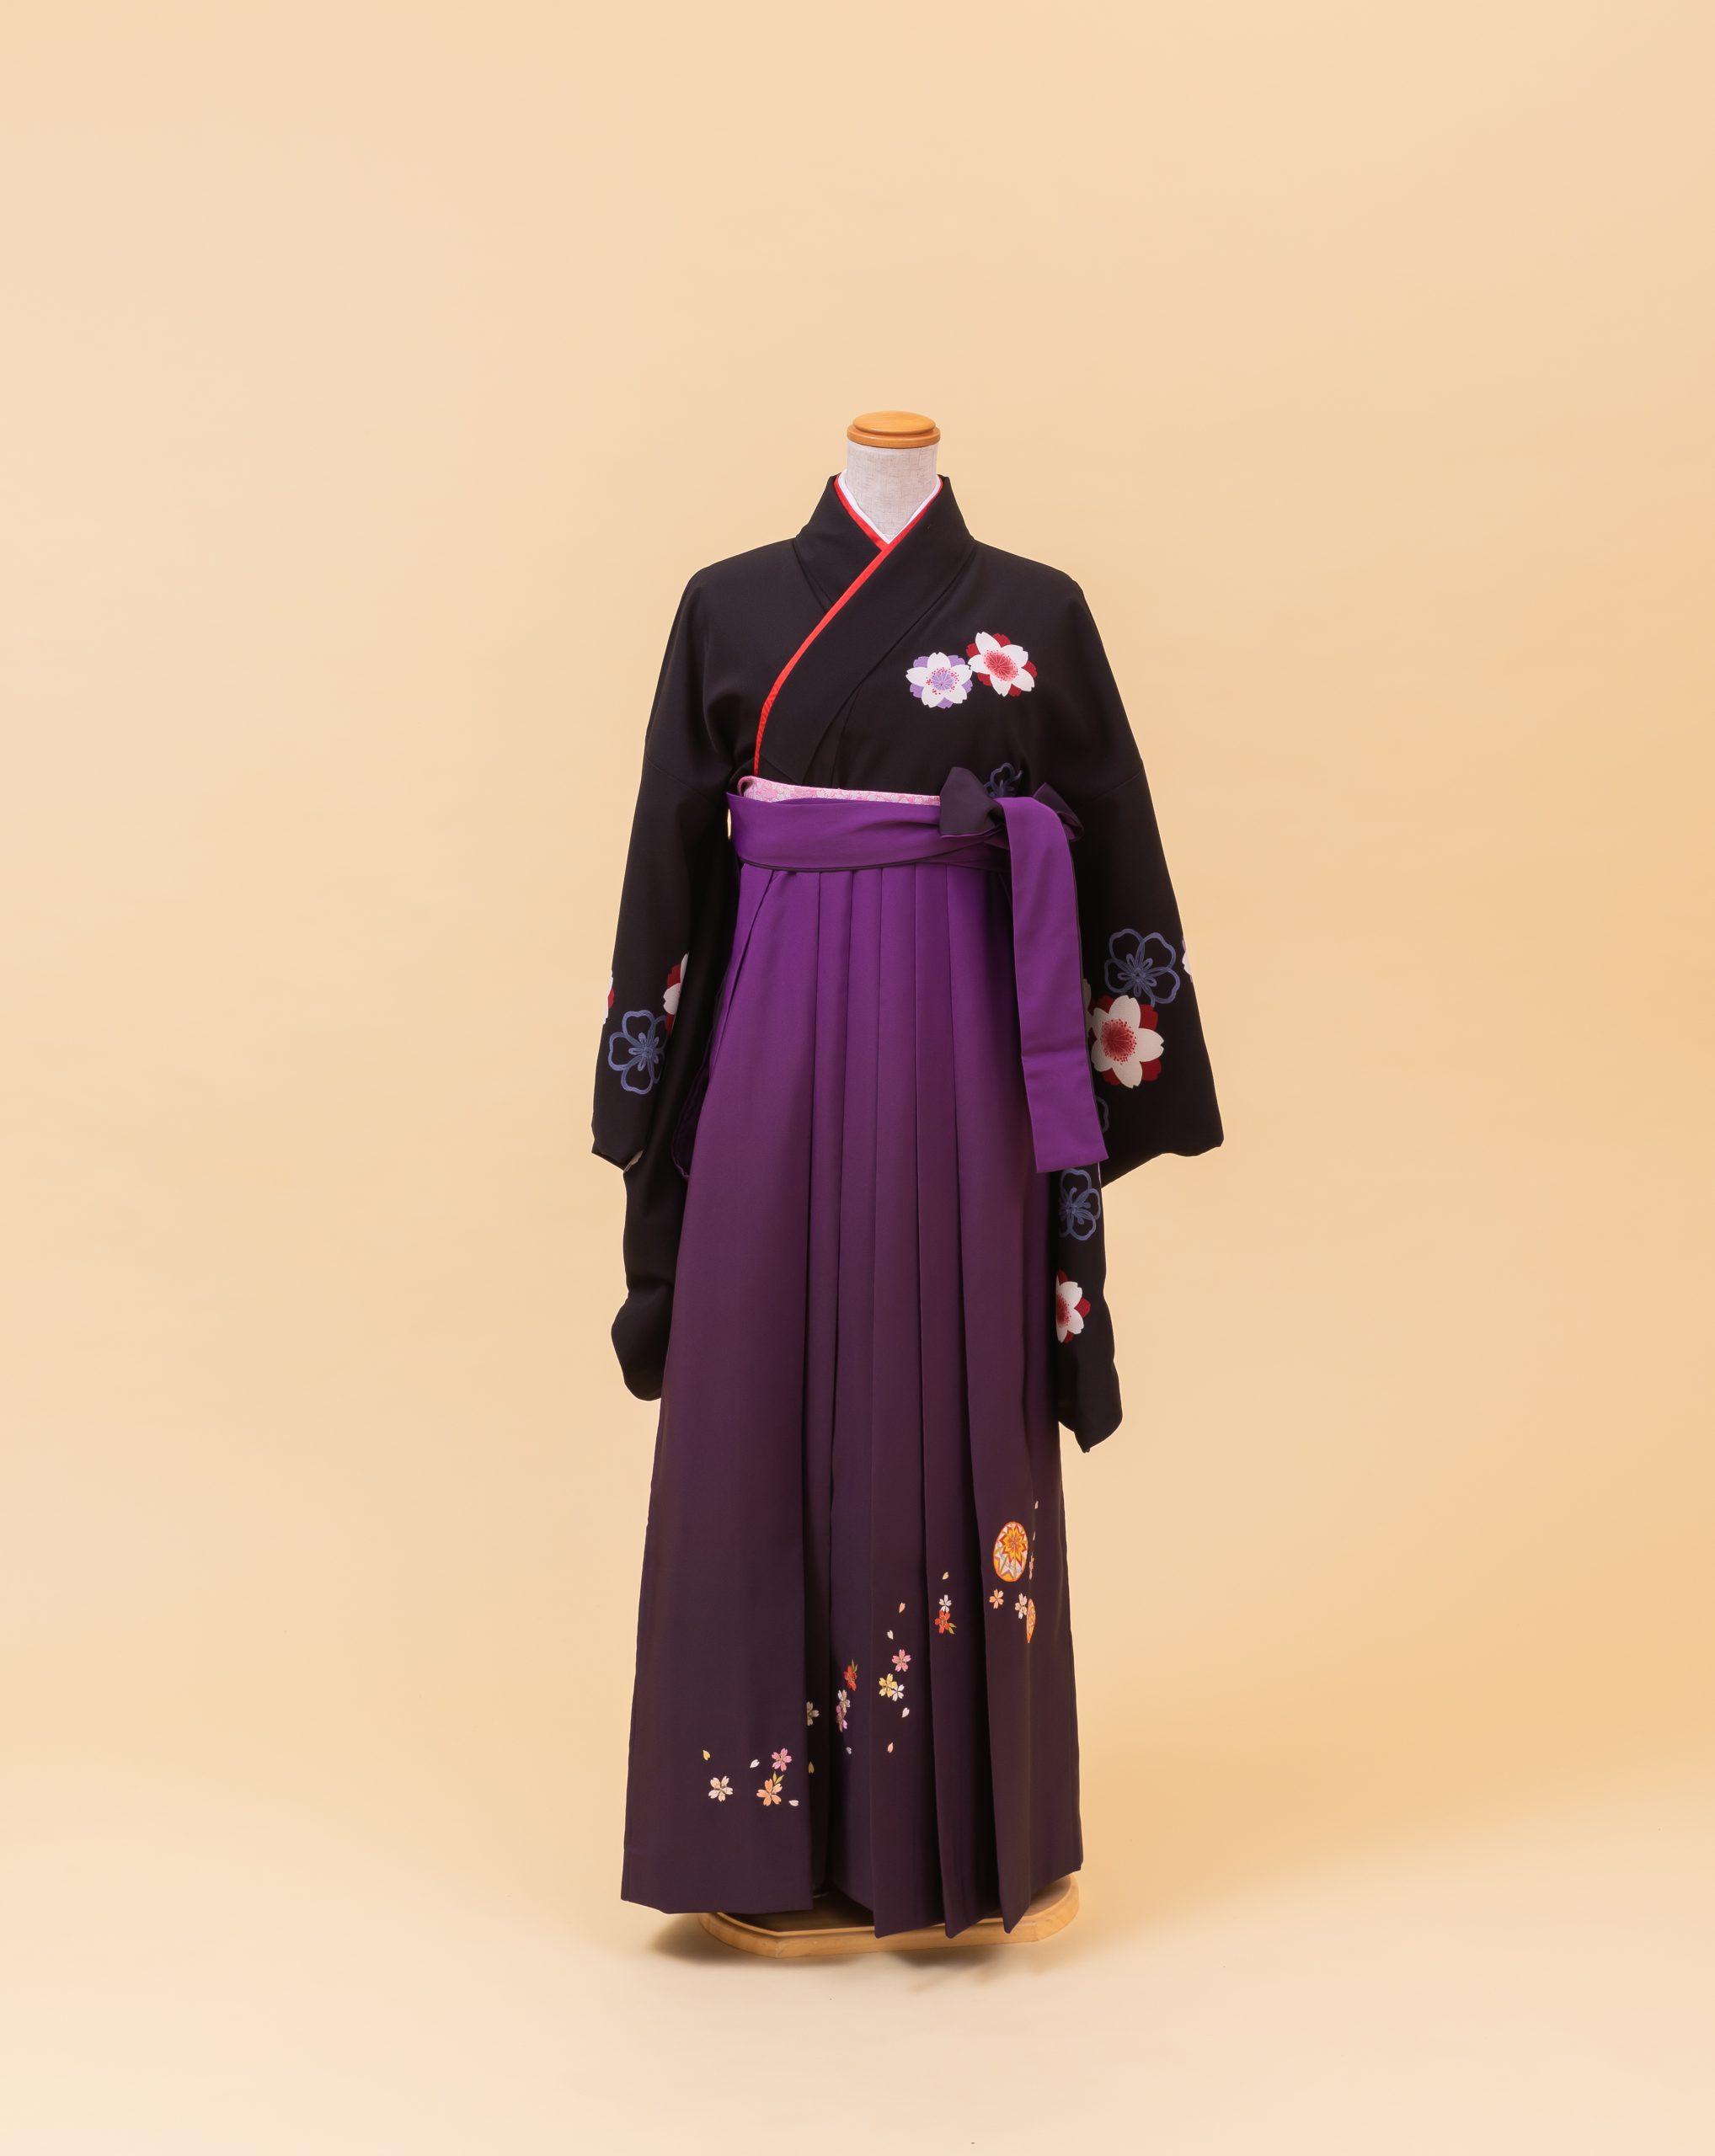 黒地 桜柄(大柄)(740067)/紫 ボカシ 鞠桜刺繍